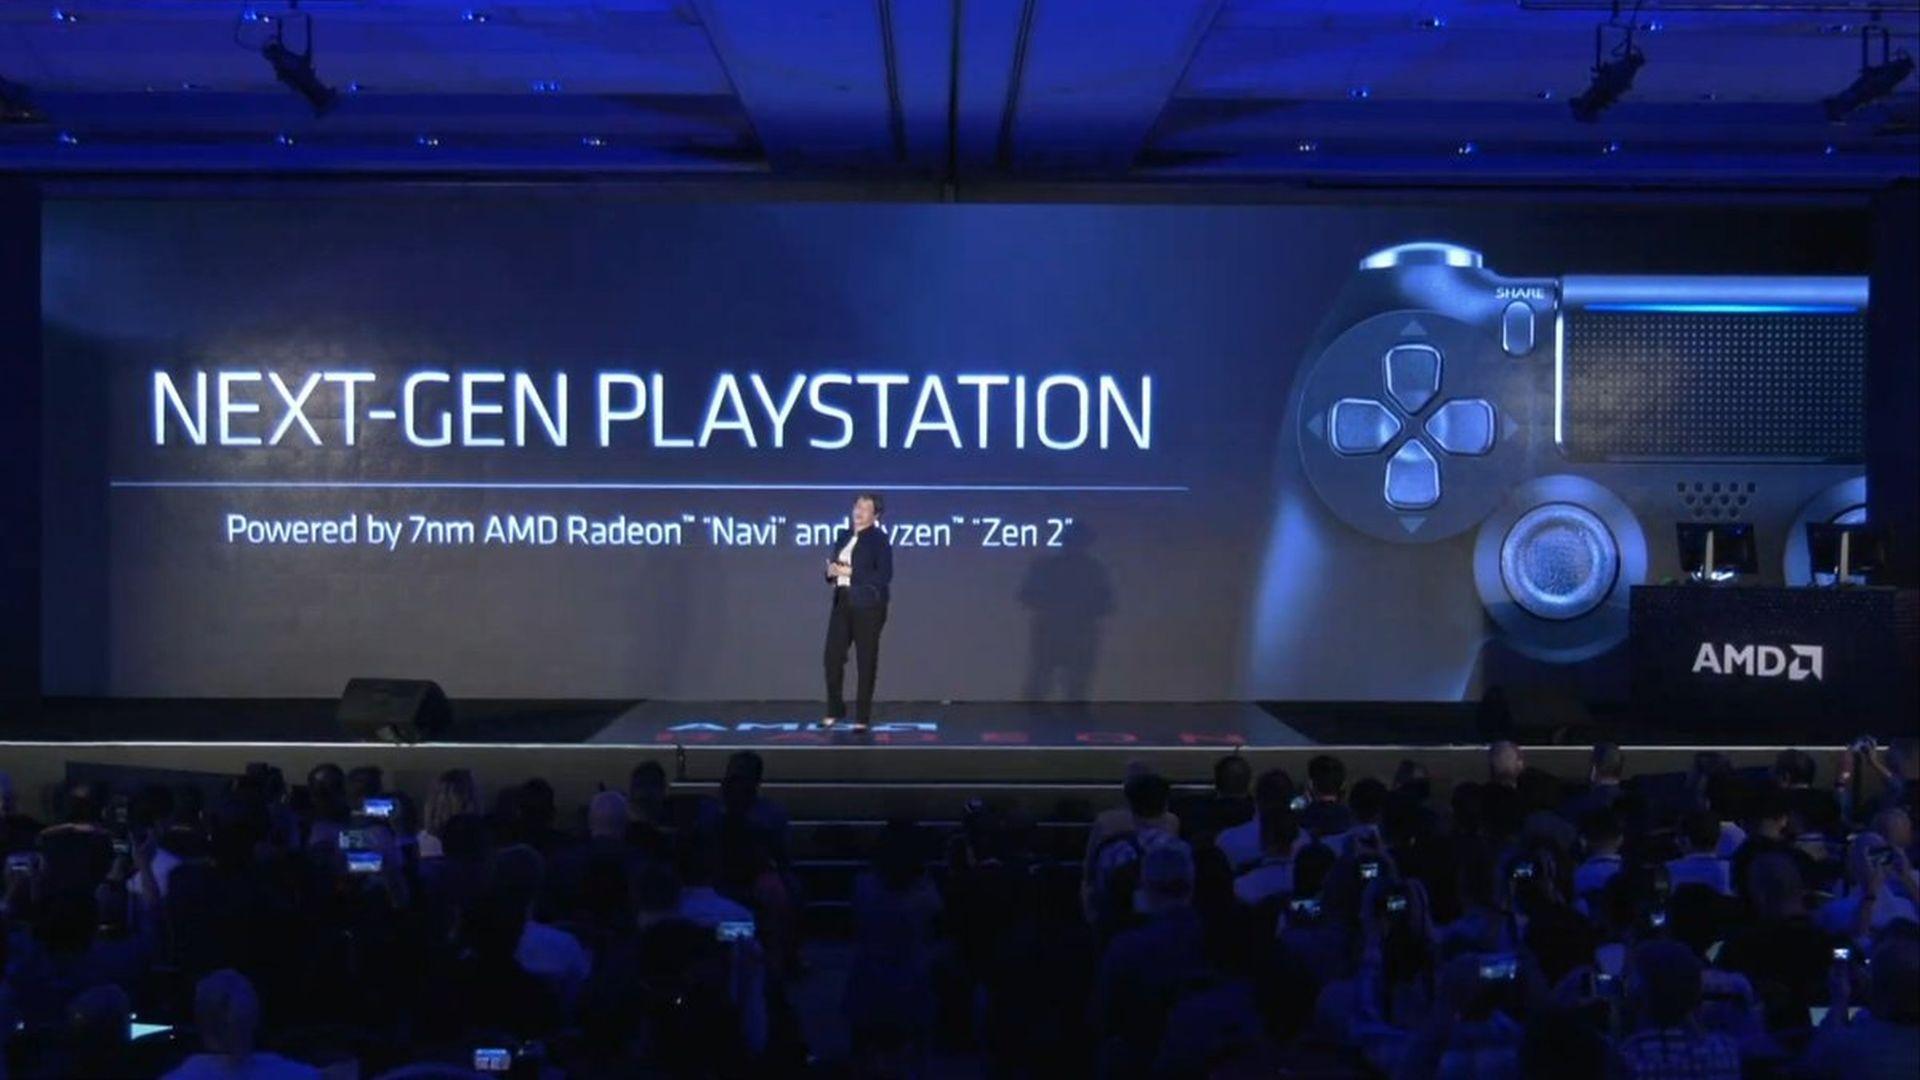 PS5_AMD Radeon Navi